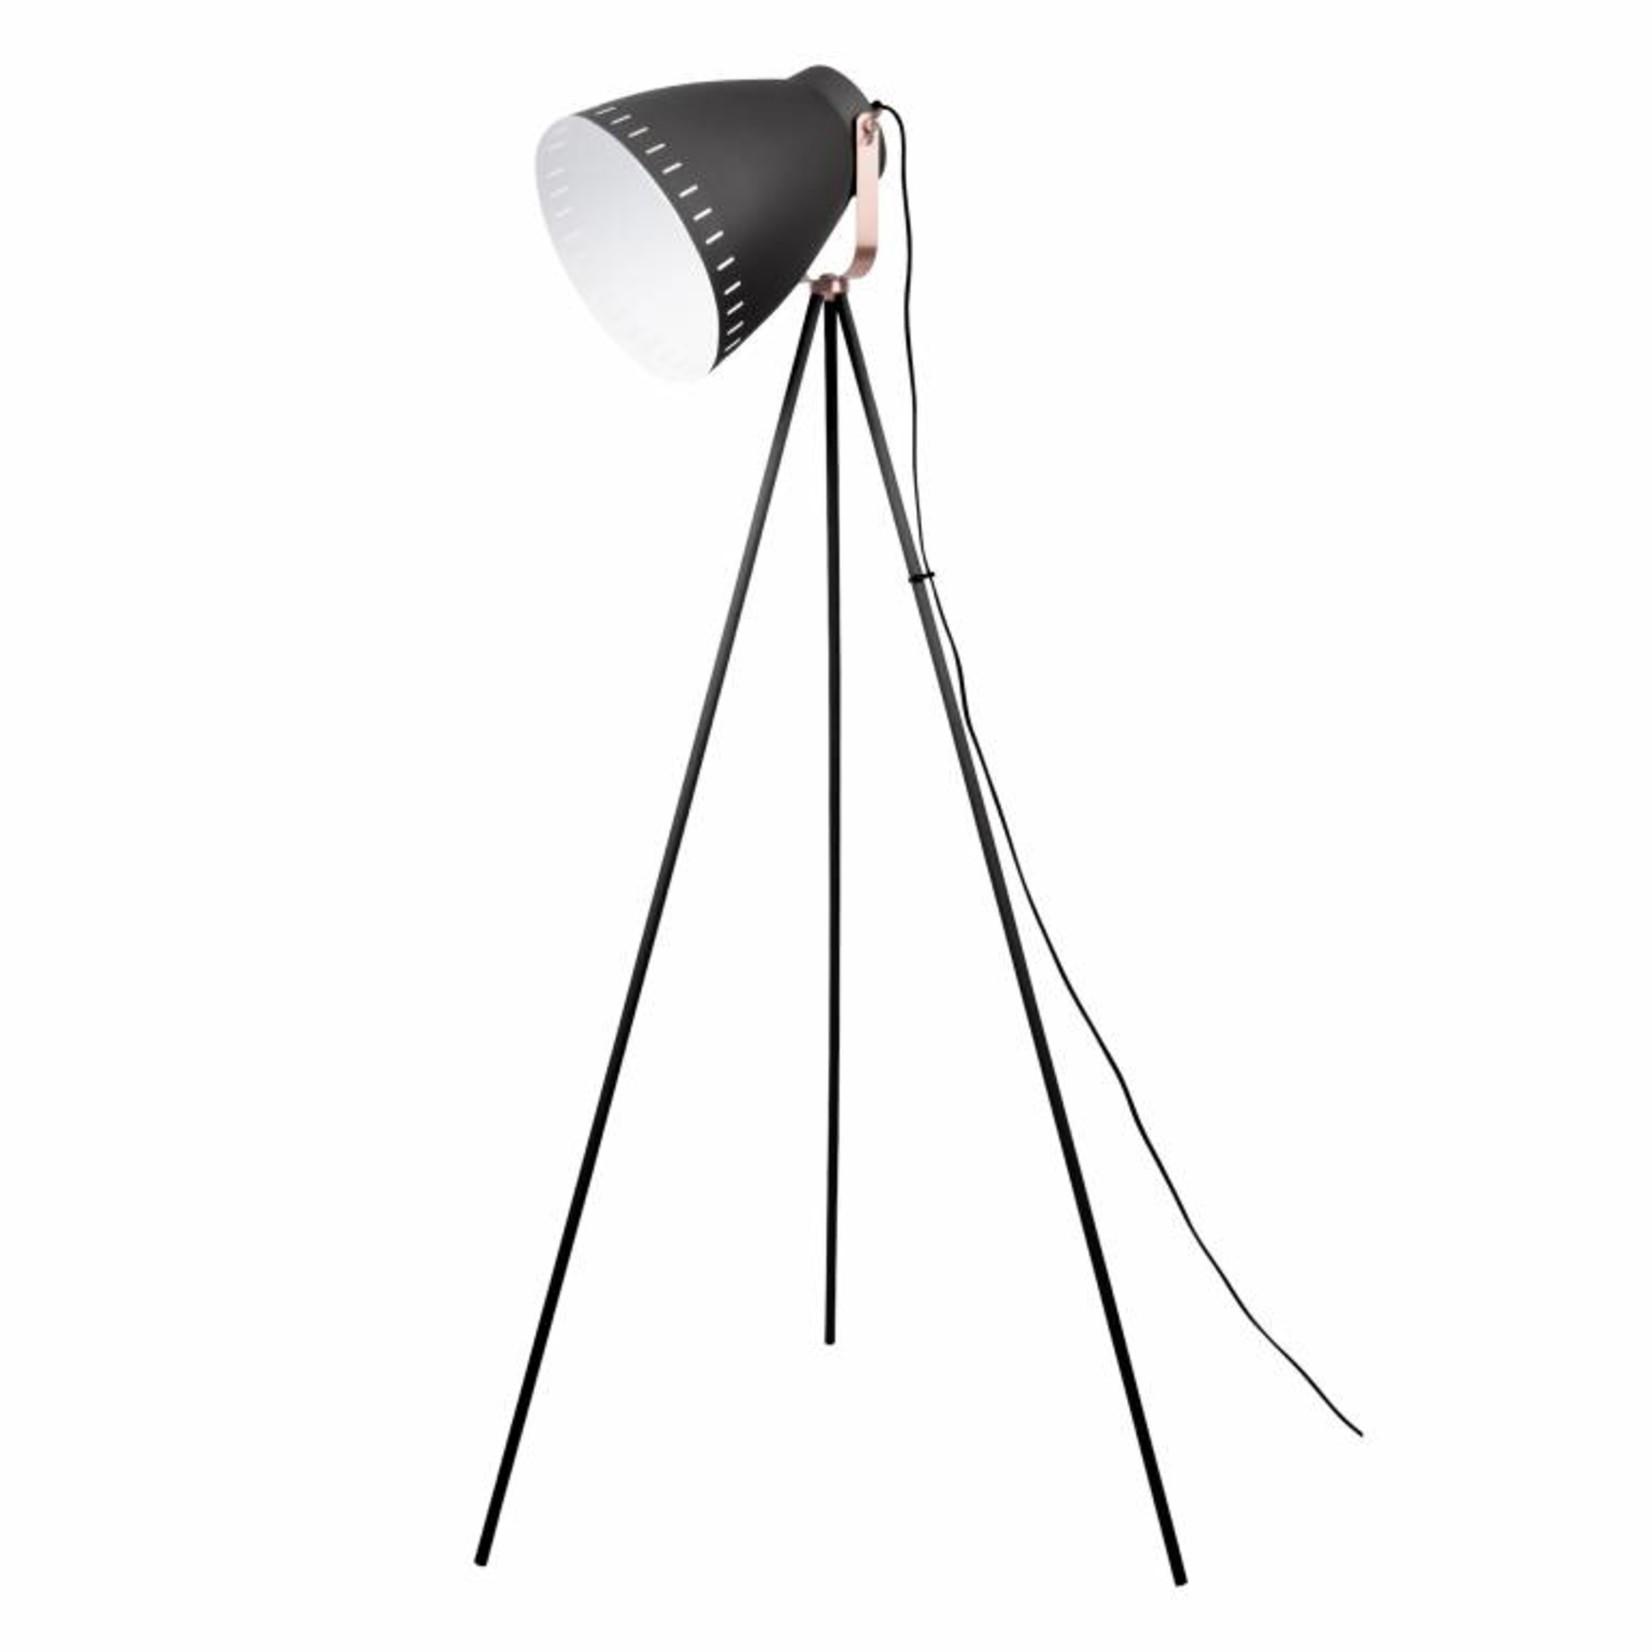 Leitmotiv Vloerlamp Mingle 3 Legs metal black LM1414